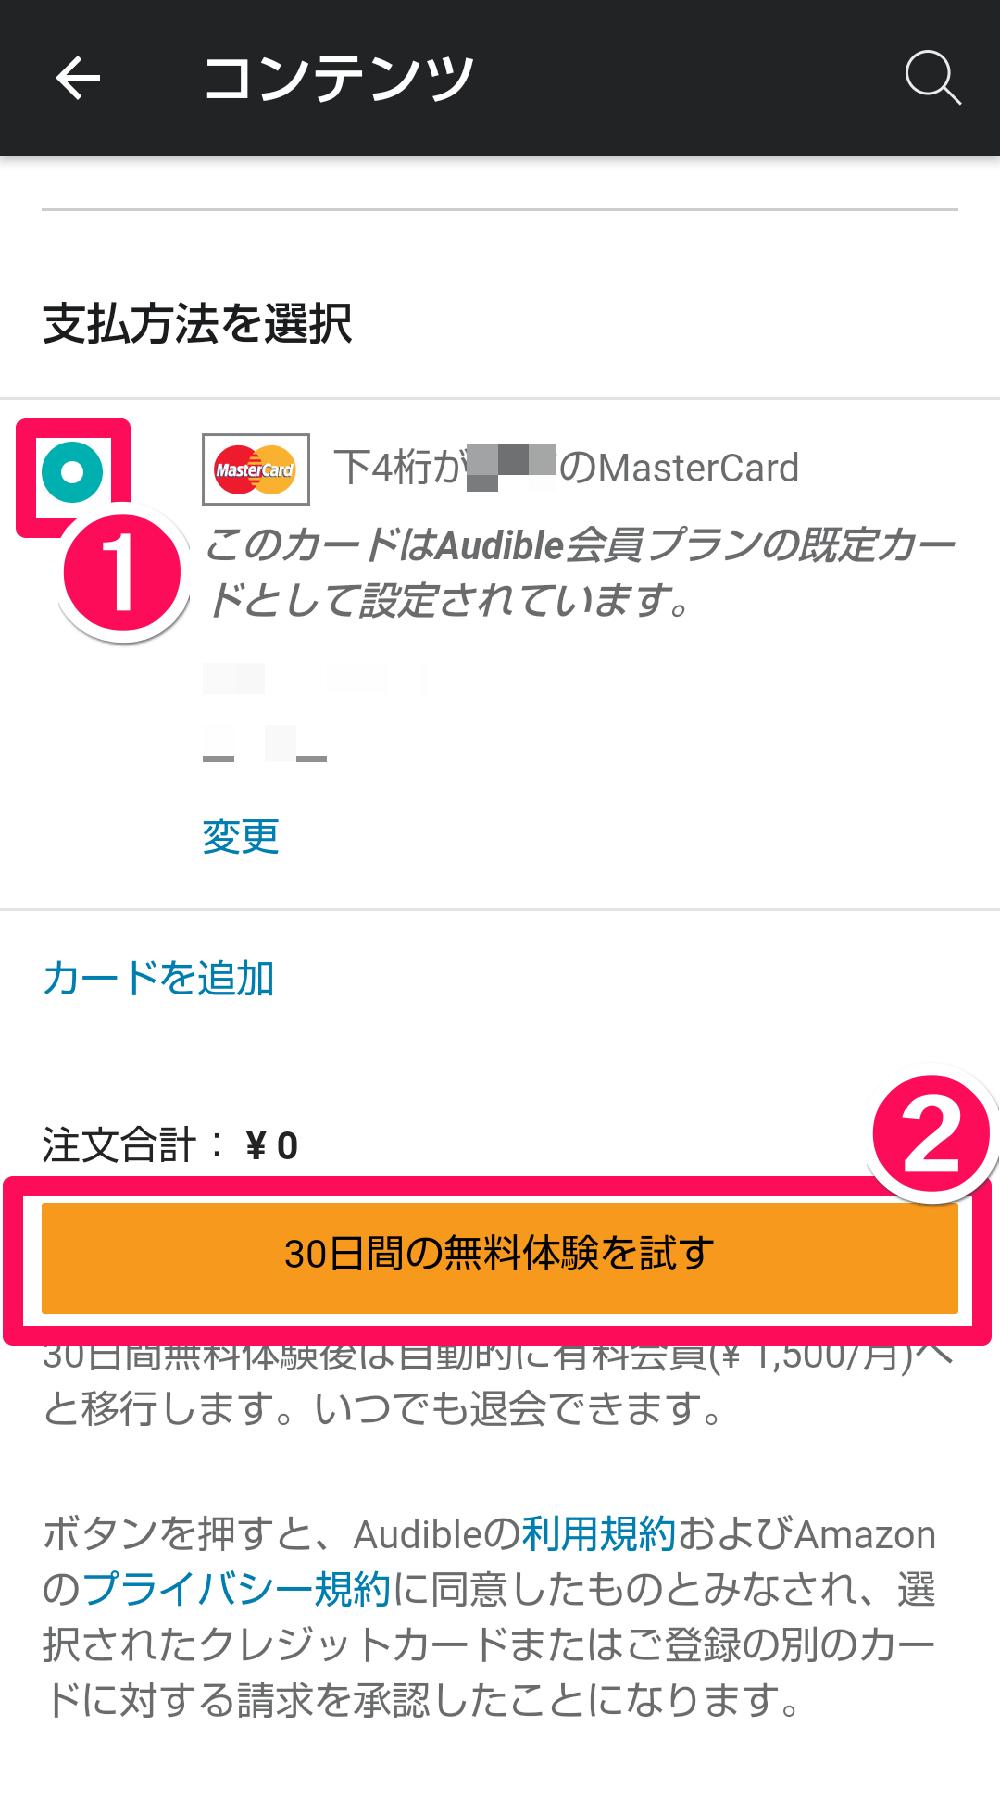 Audibleアプリ(オーディブルアプリ)の「支払方法を選択」画面